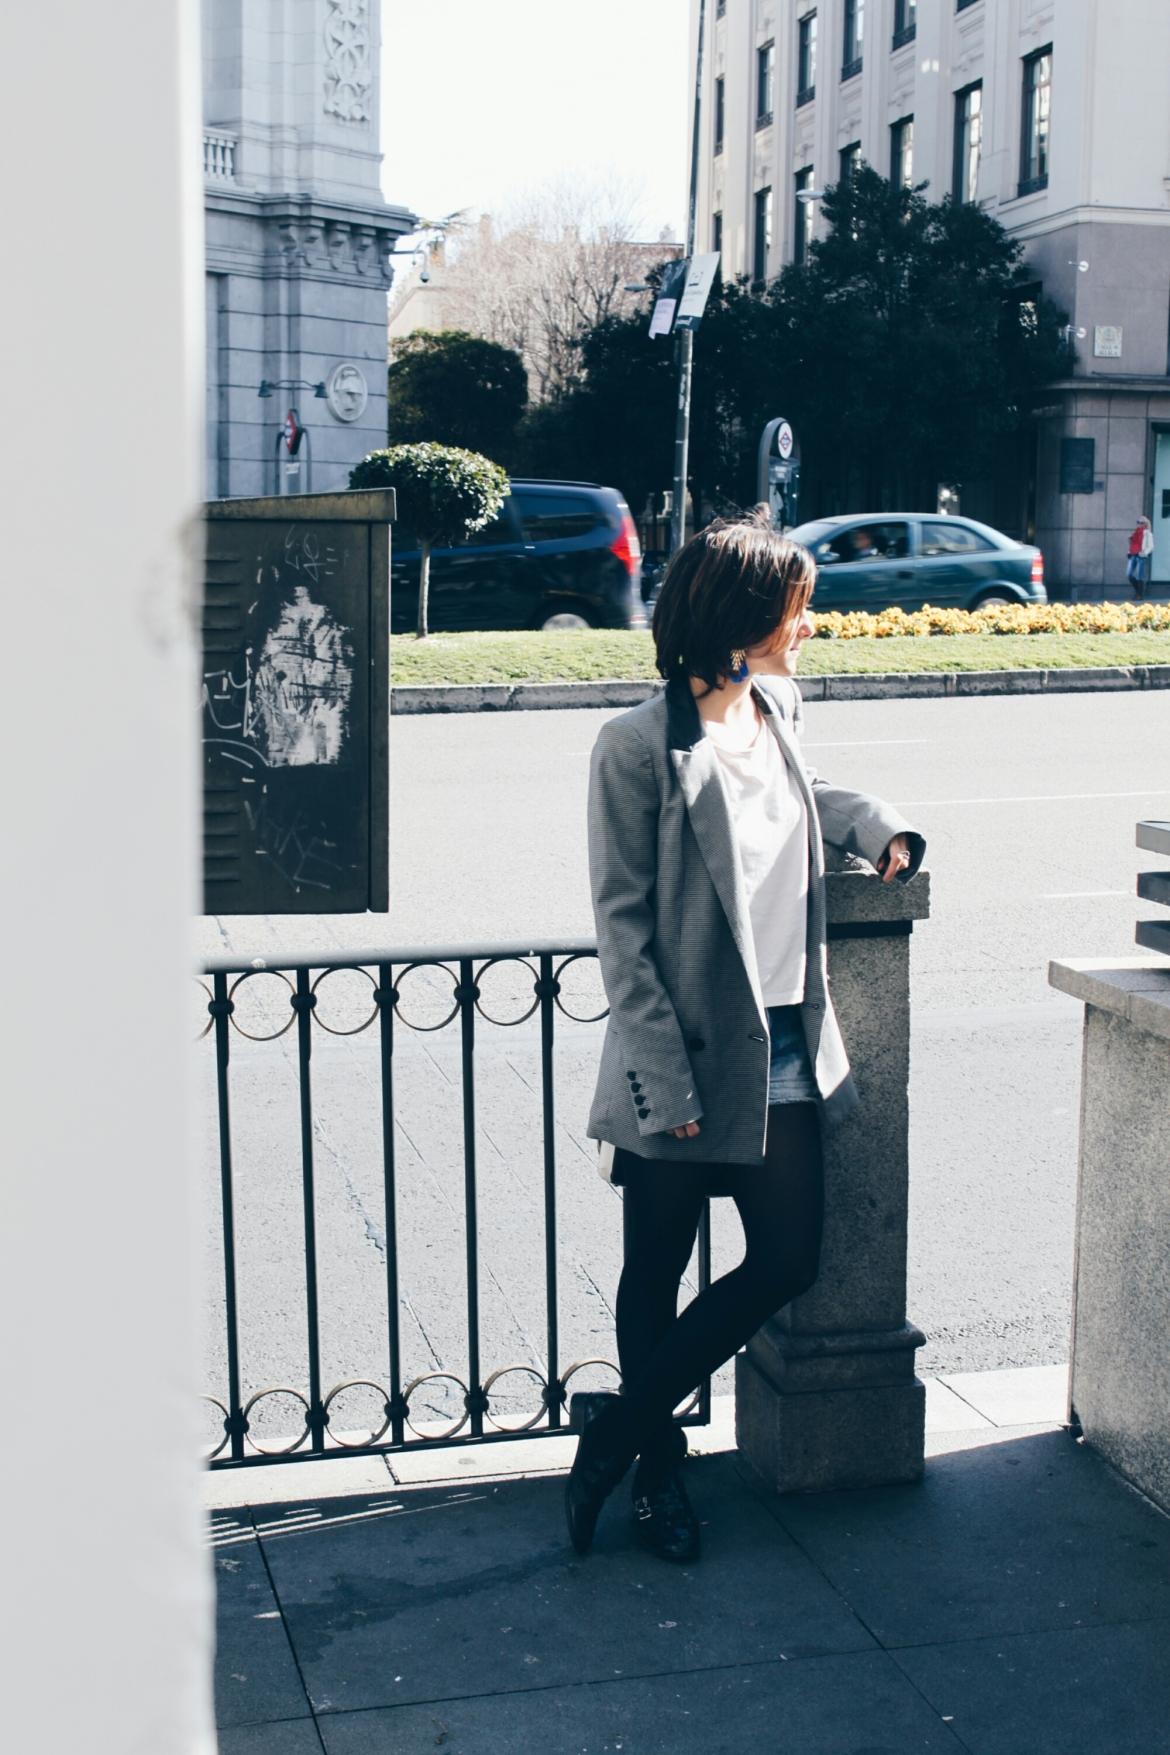 blog blogger bloguera blogueras carmen marta twins twin gemela gemelas fashion moda blazer americana outfit look madrid